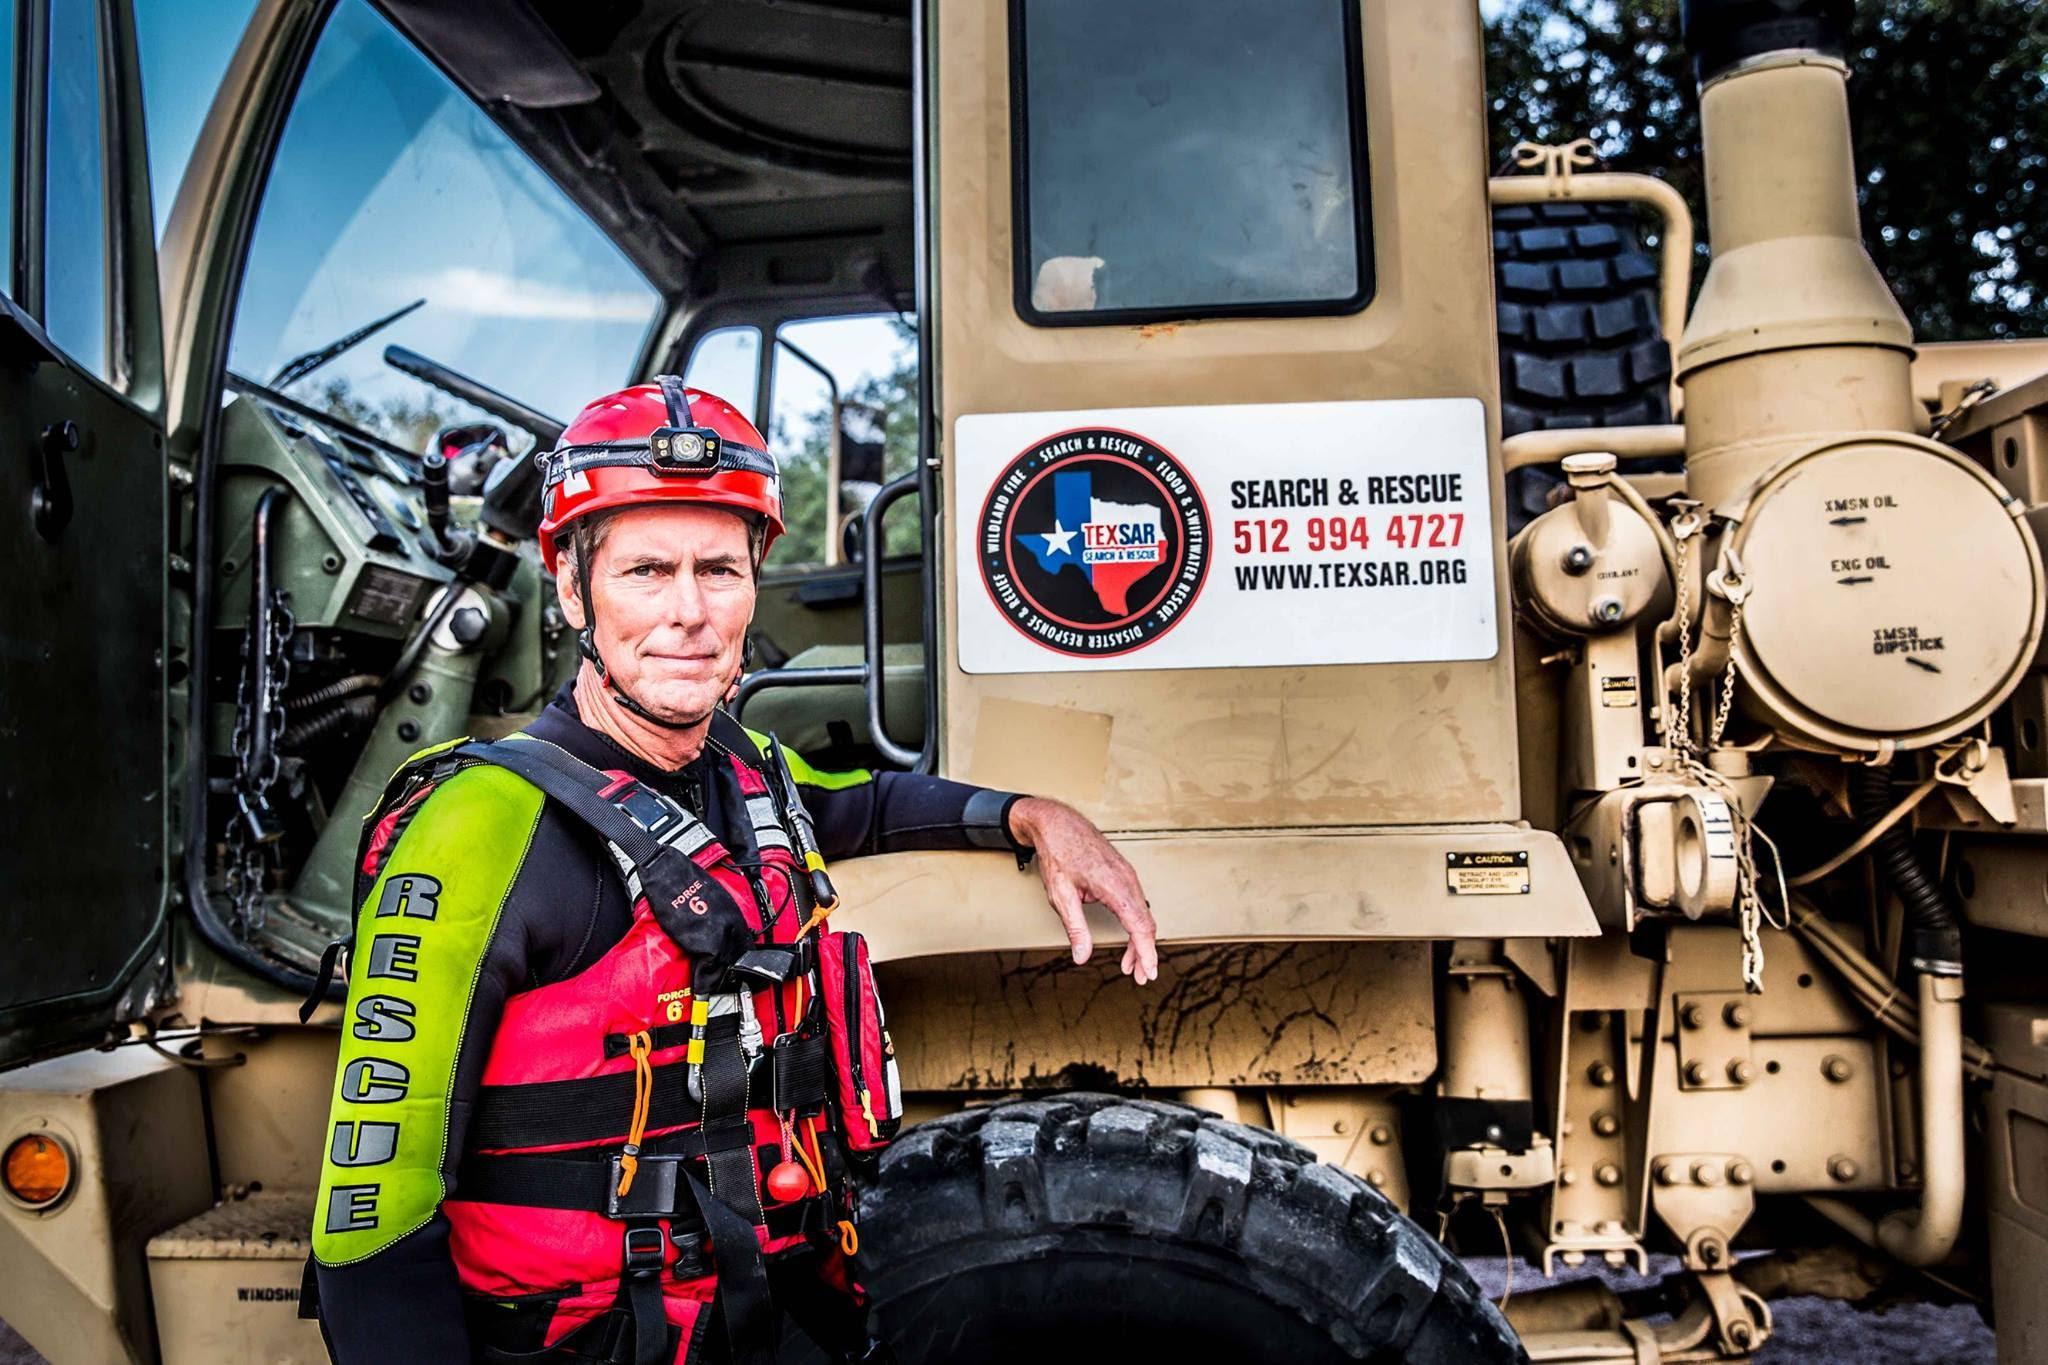 Texsar Texas Search And Rescue